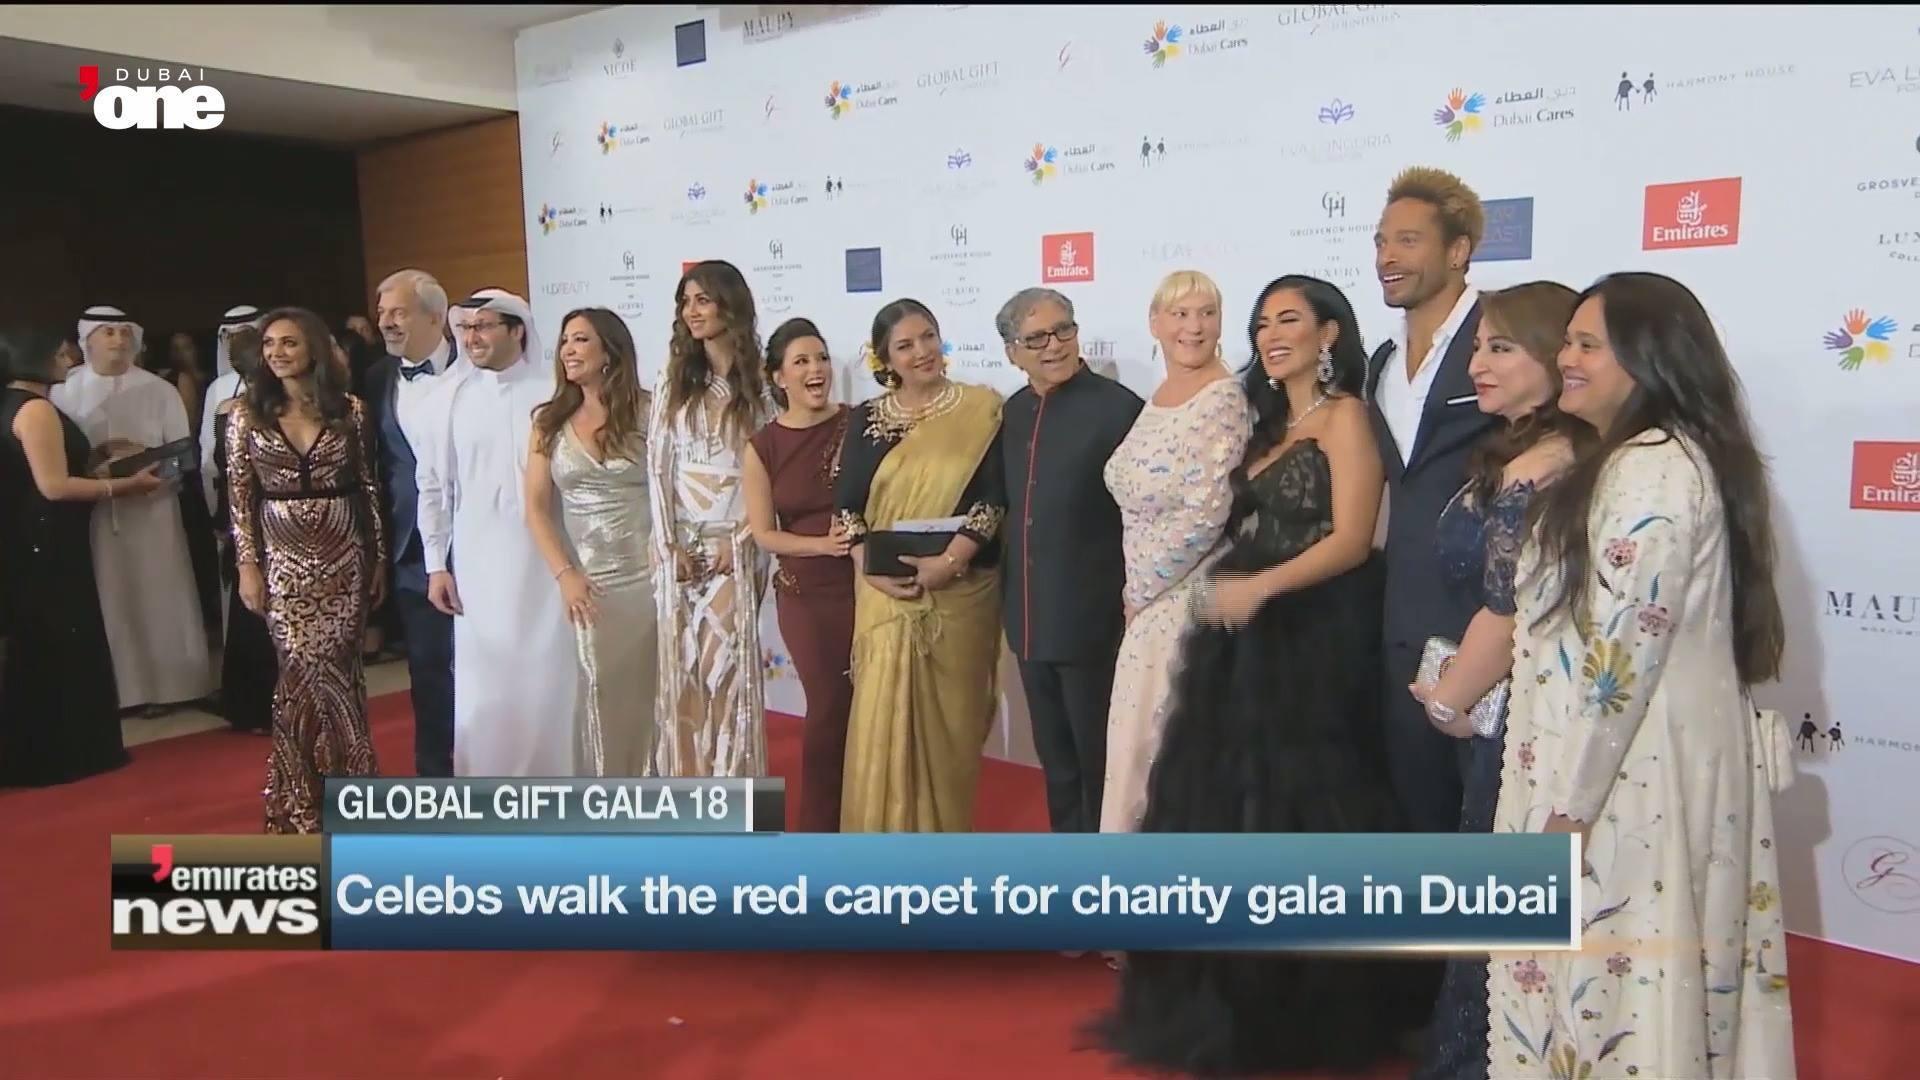 Stars shine at the Global Gift Gala in Dubai